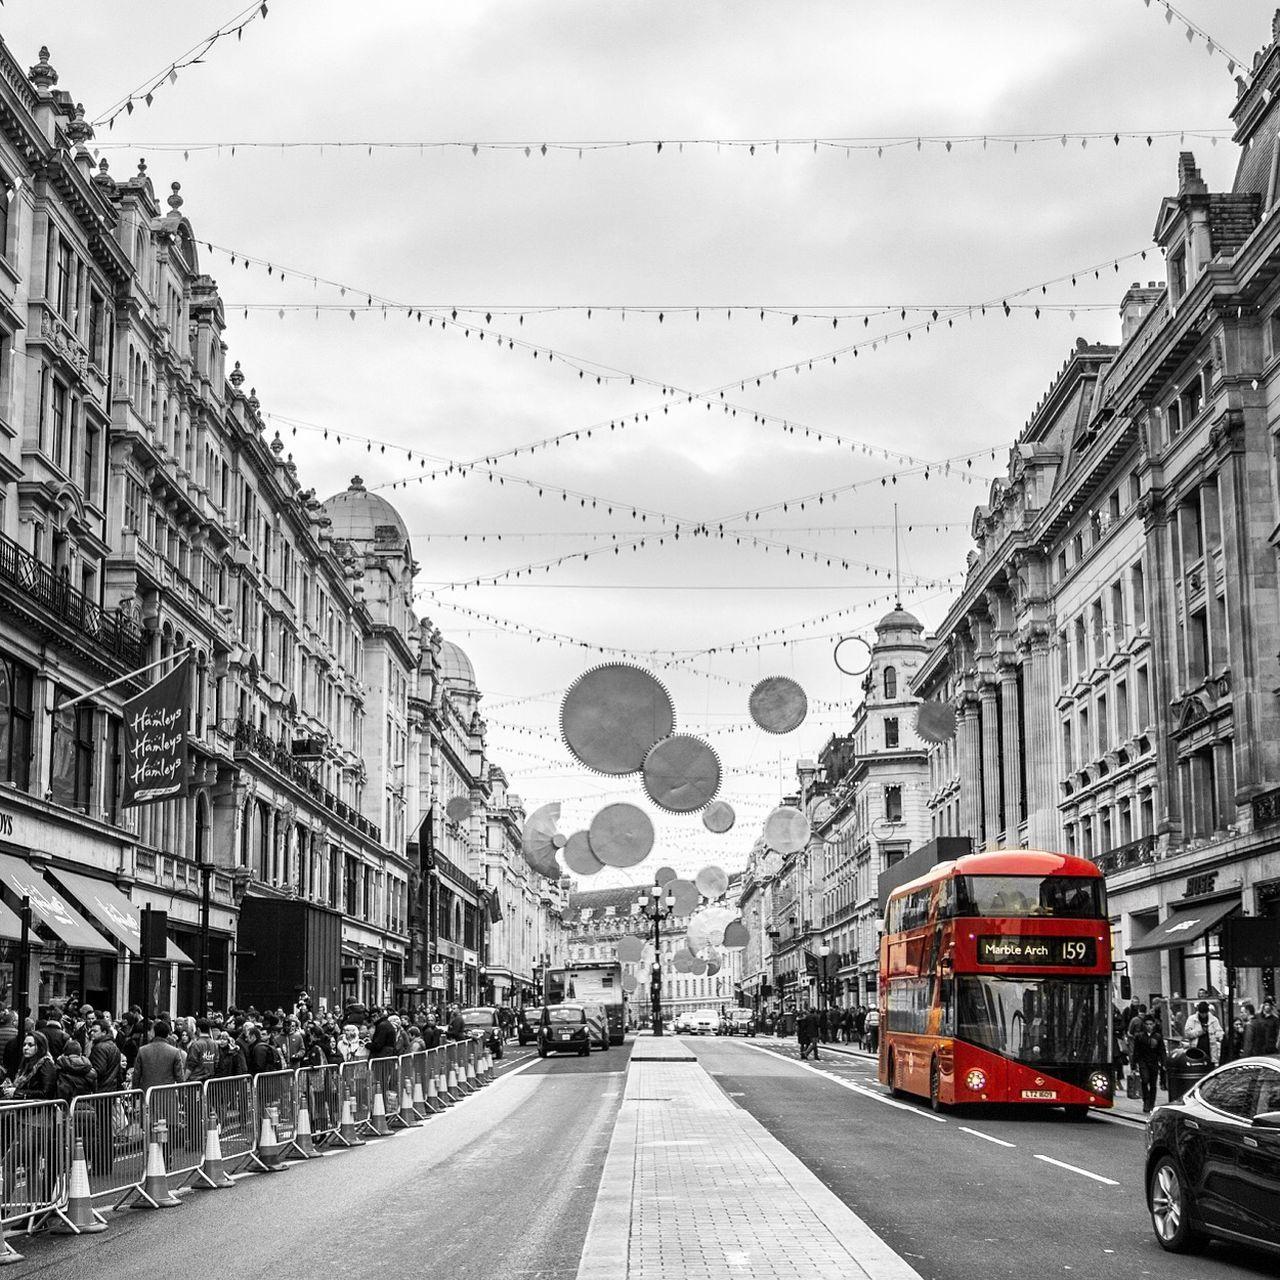 Shopping in regent street London Regentstreet EyeEm Best Shots Check This Out Taking Photos Enjoying Life Blackandwhite Pmg_lon